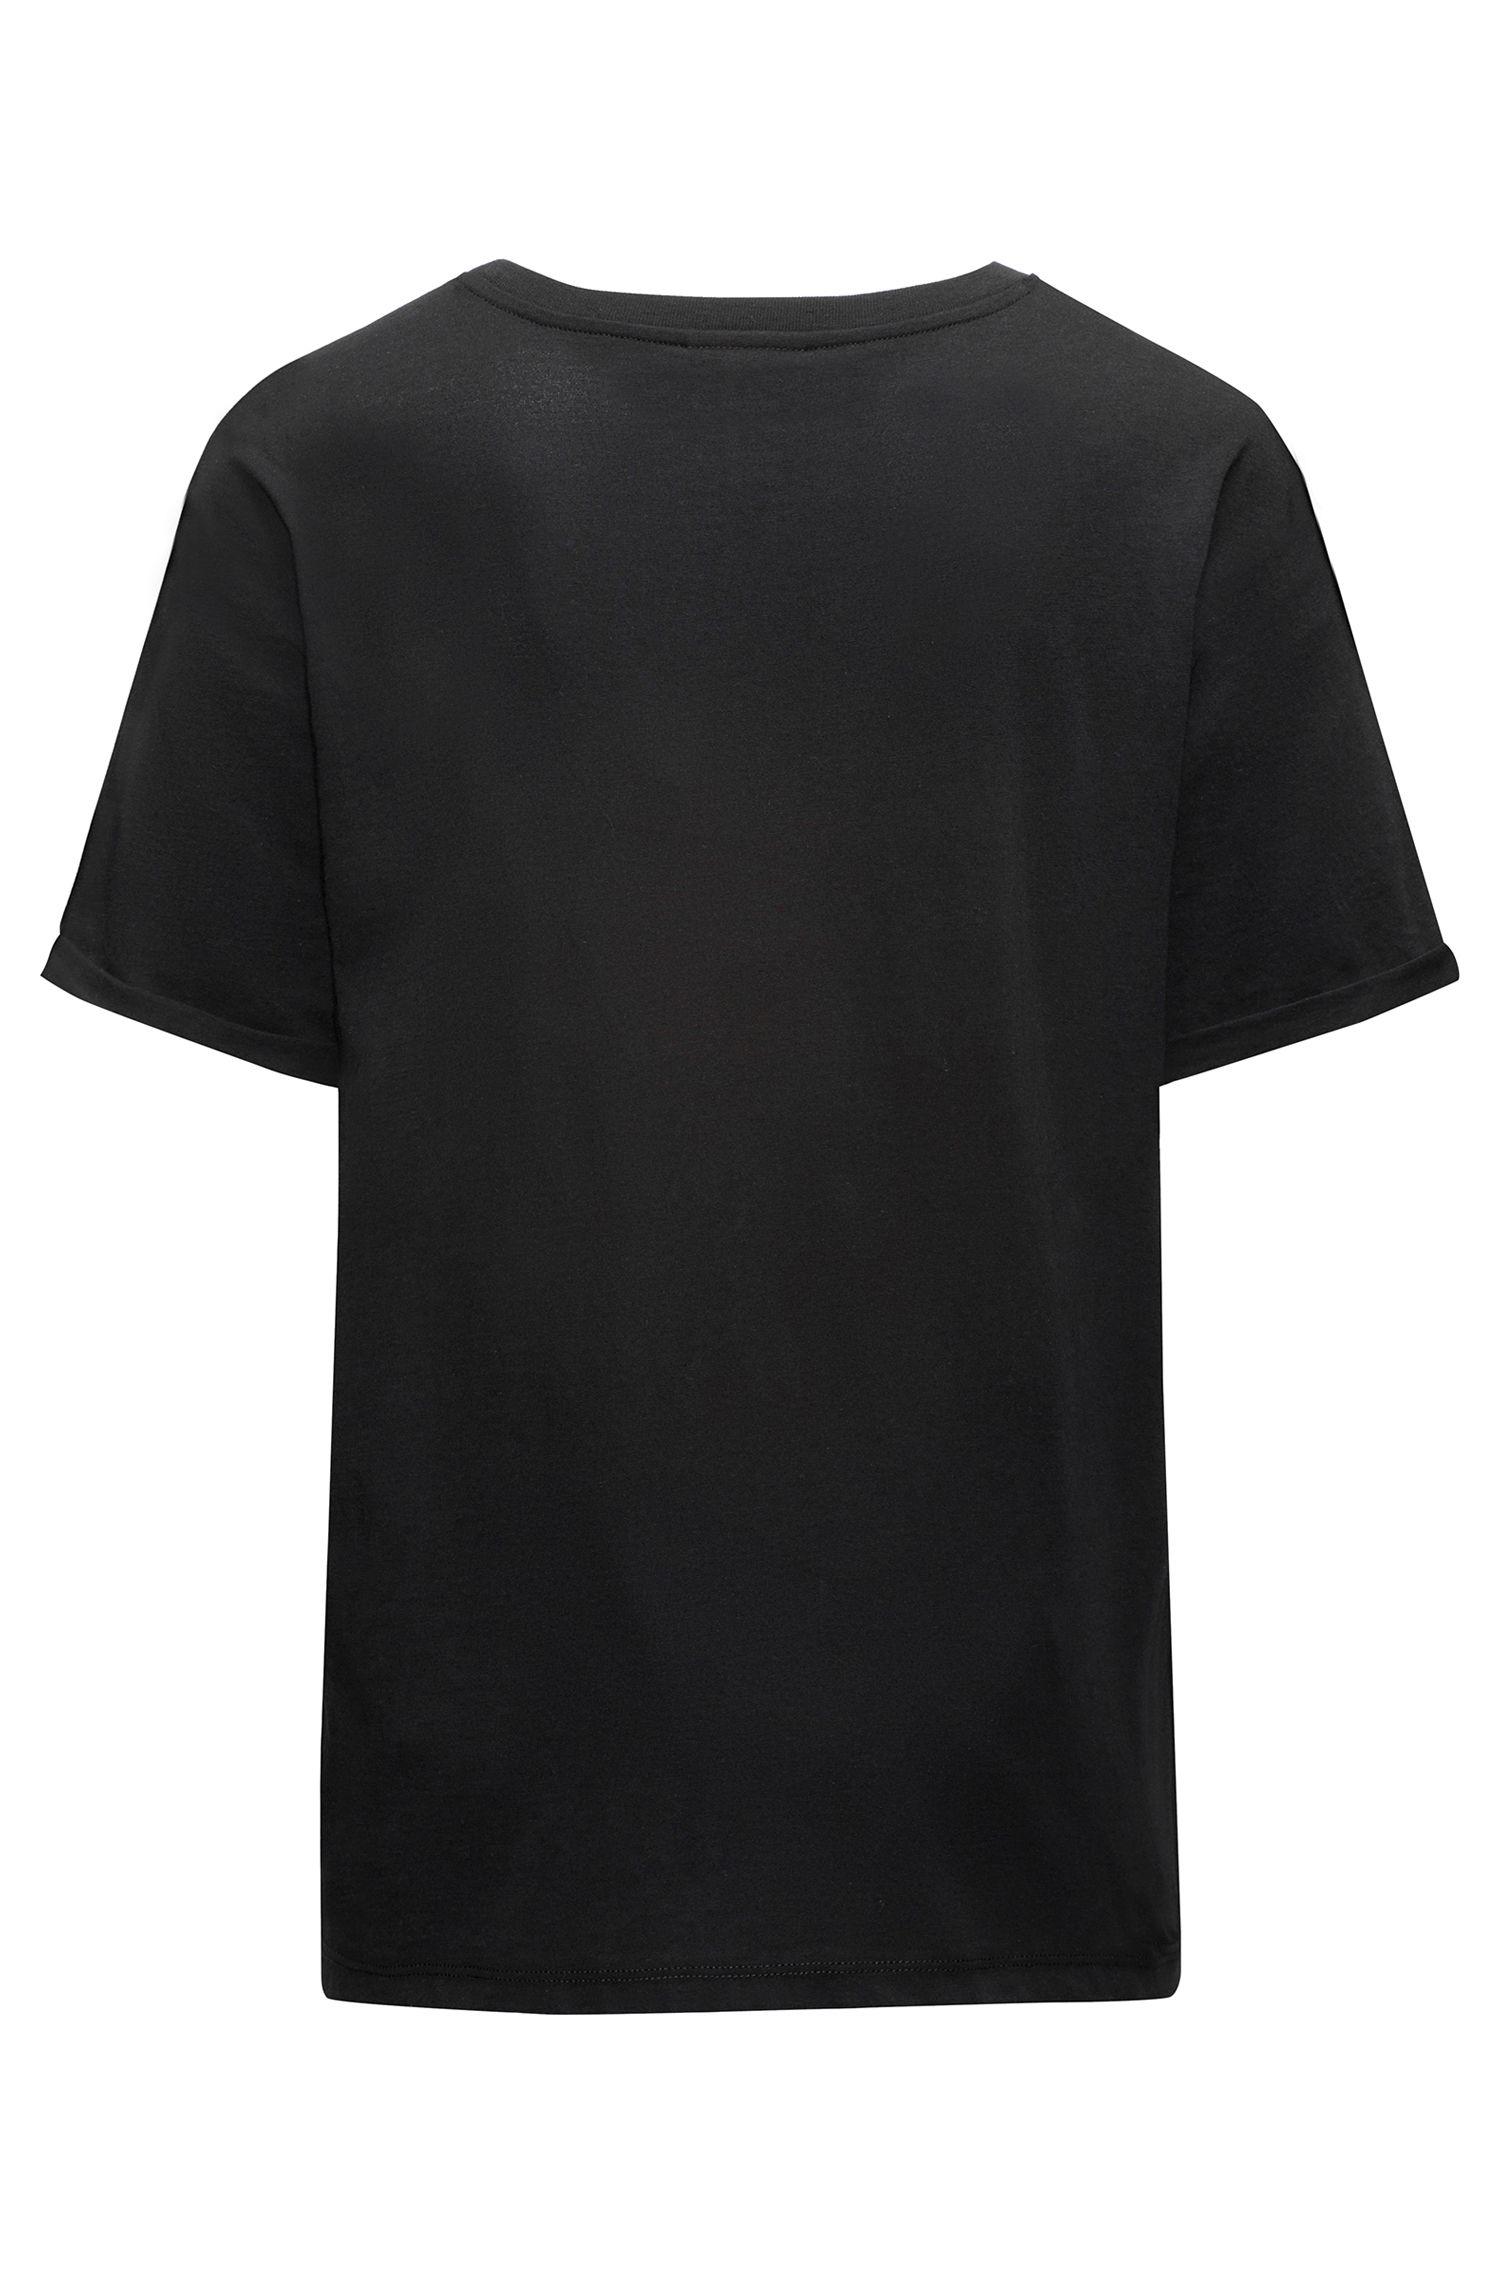 Camiseta de manga corta en algodón con un logo invertido metálico